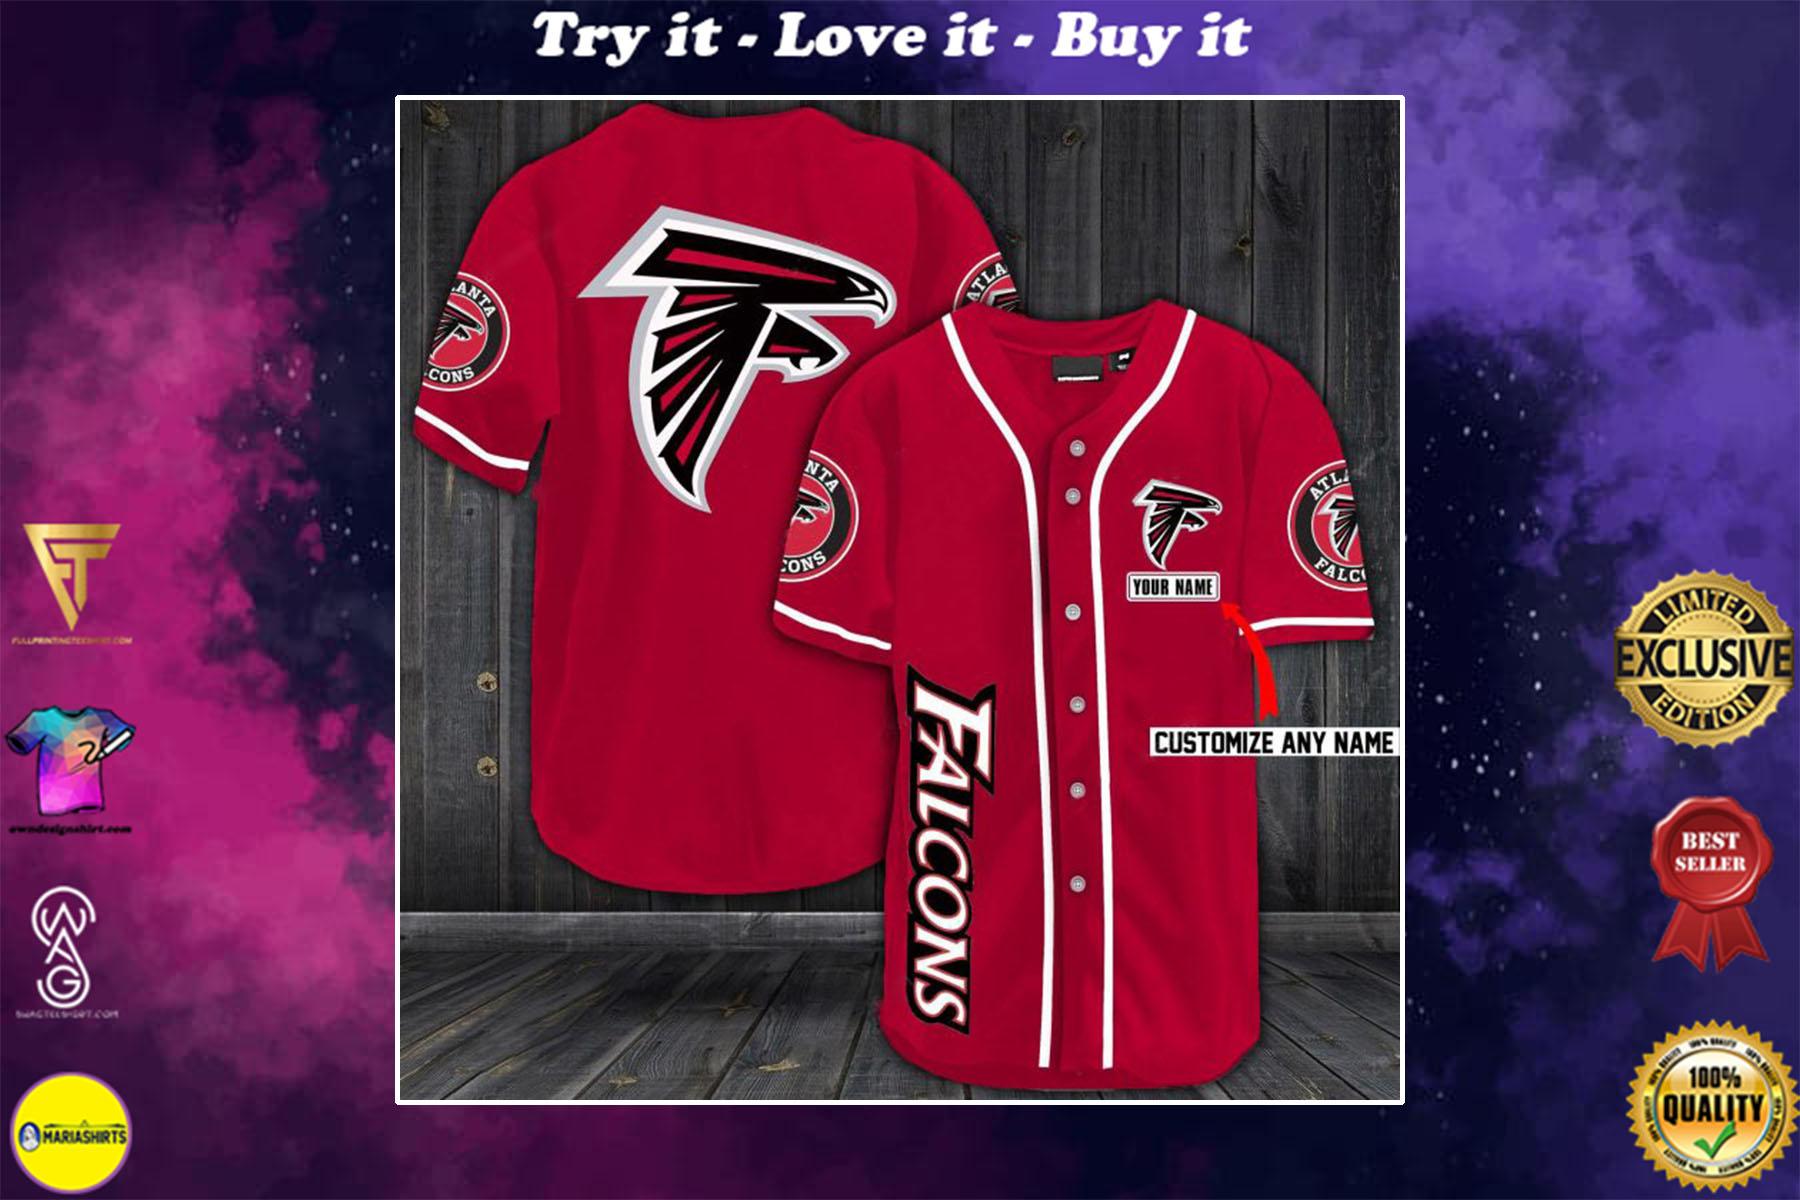 [special edition] personalized name jersey atlanta falcons shirt - maria